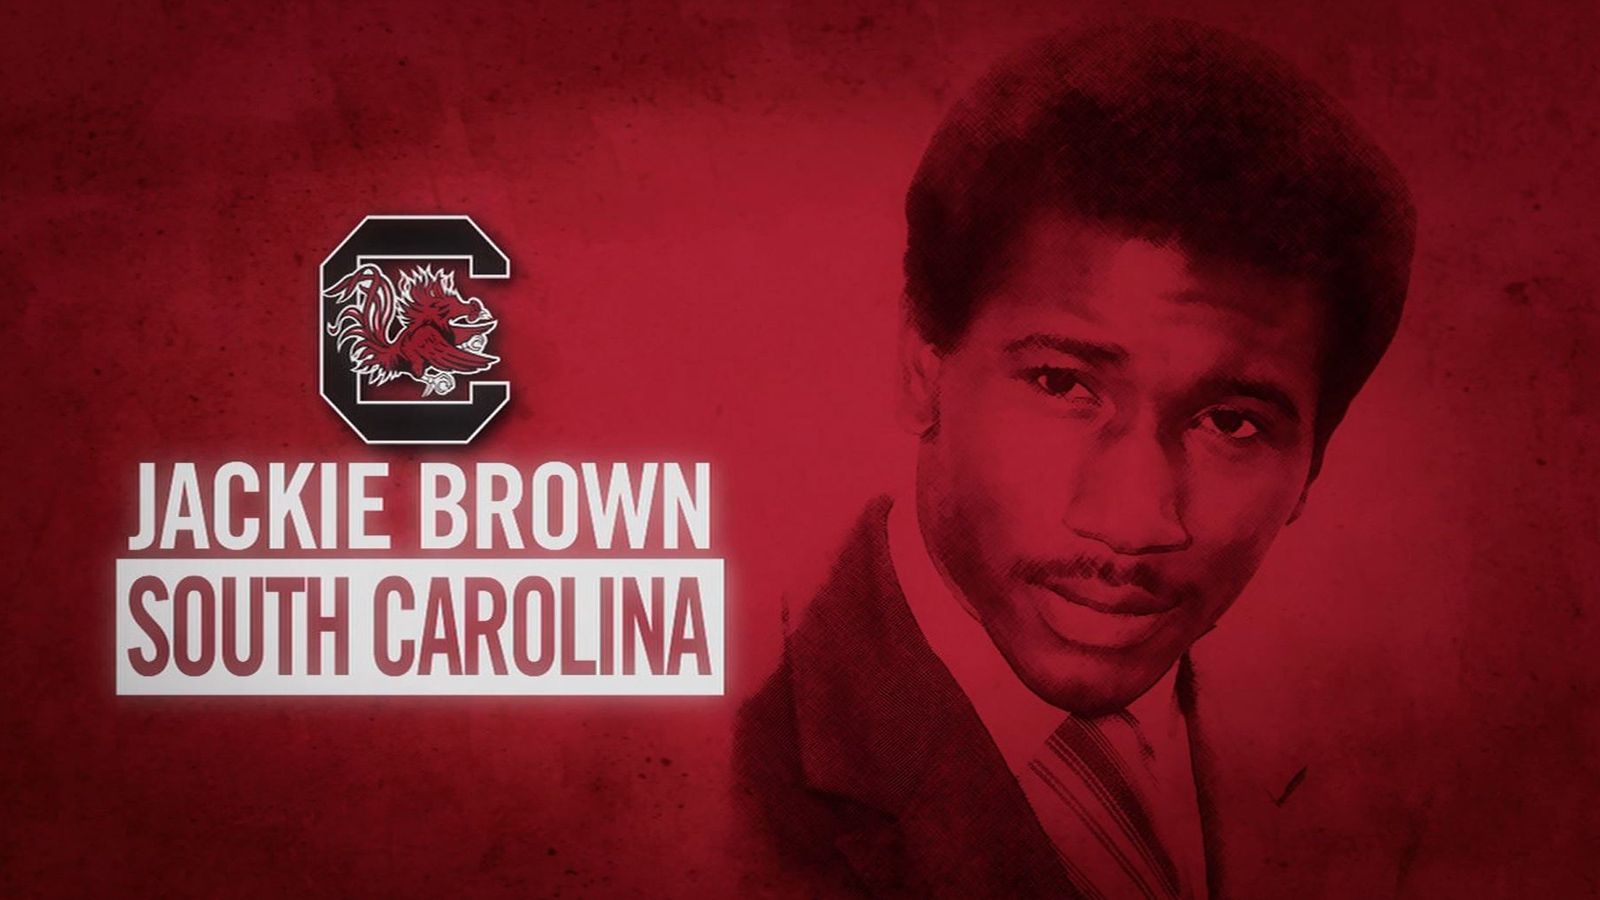 SEC celebrates Black History Month: South Carolina